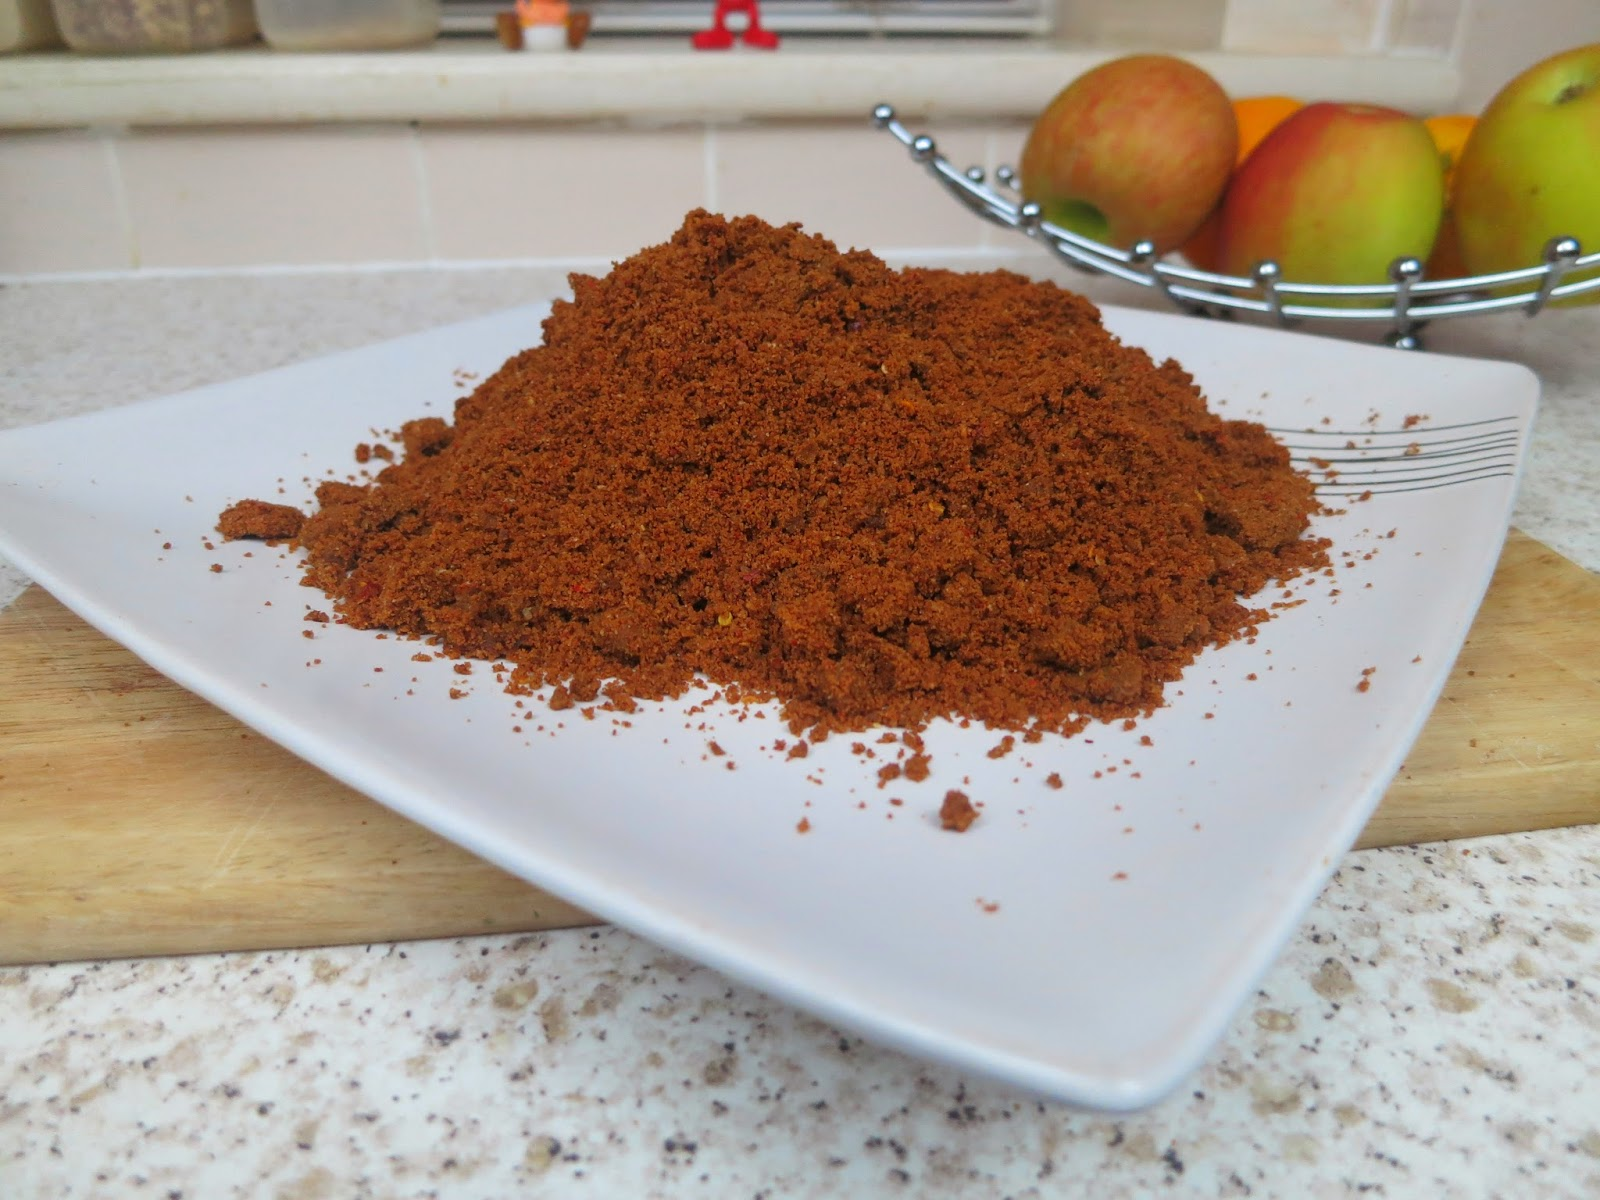 How to make Nigerian Suya Spice